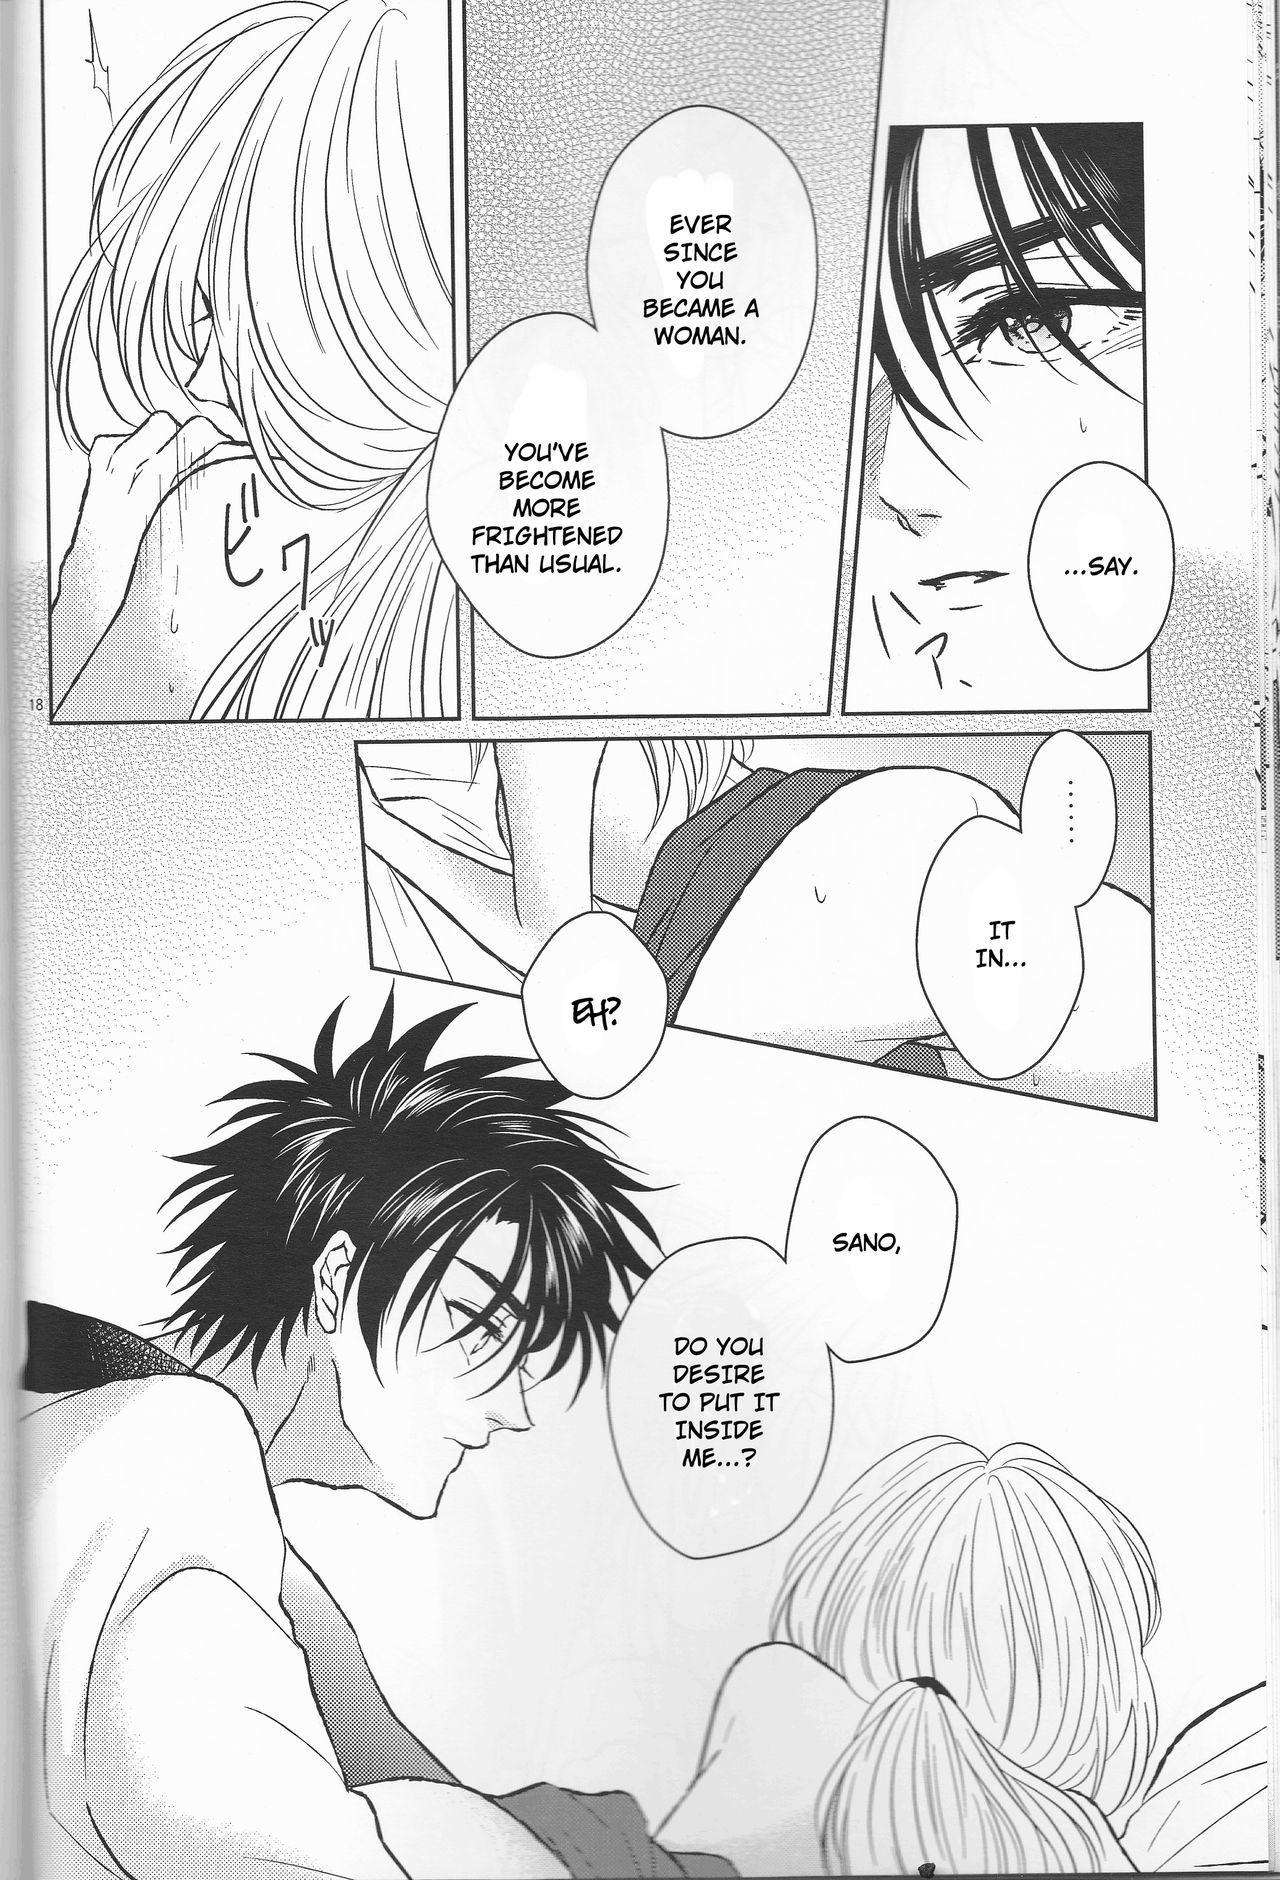 Hime ken ryoran page 18